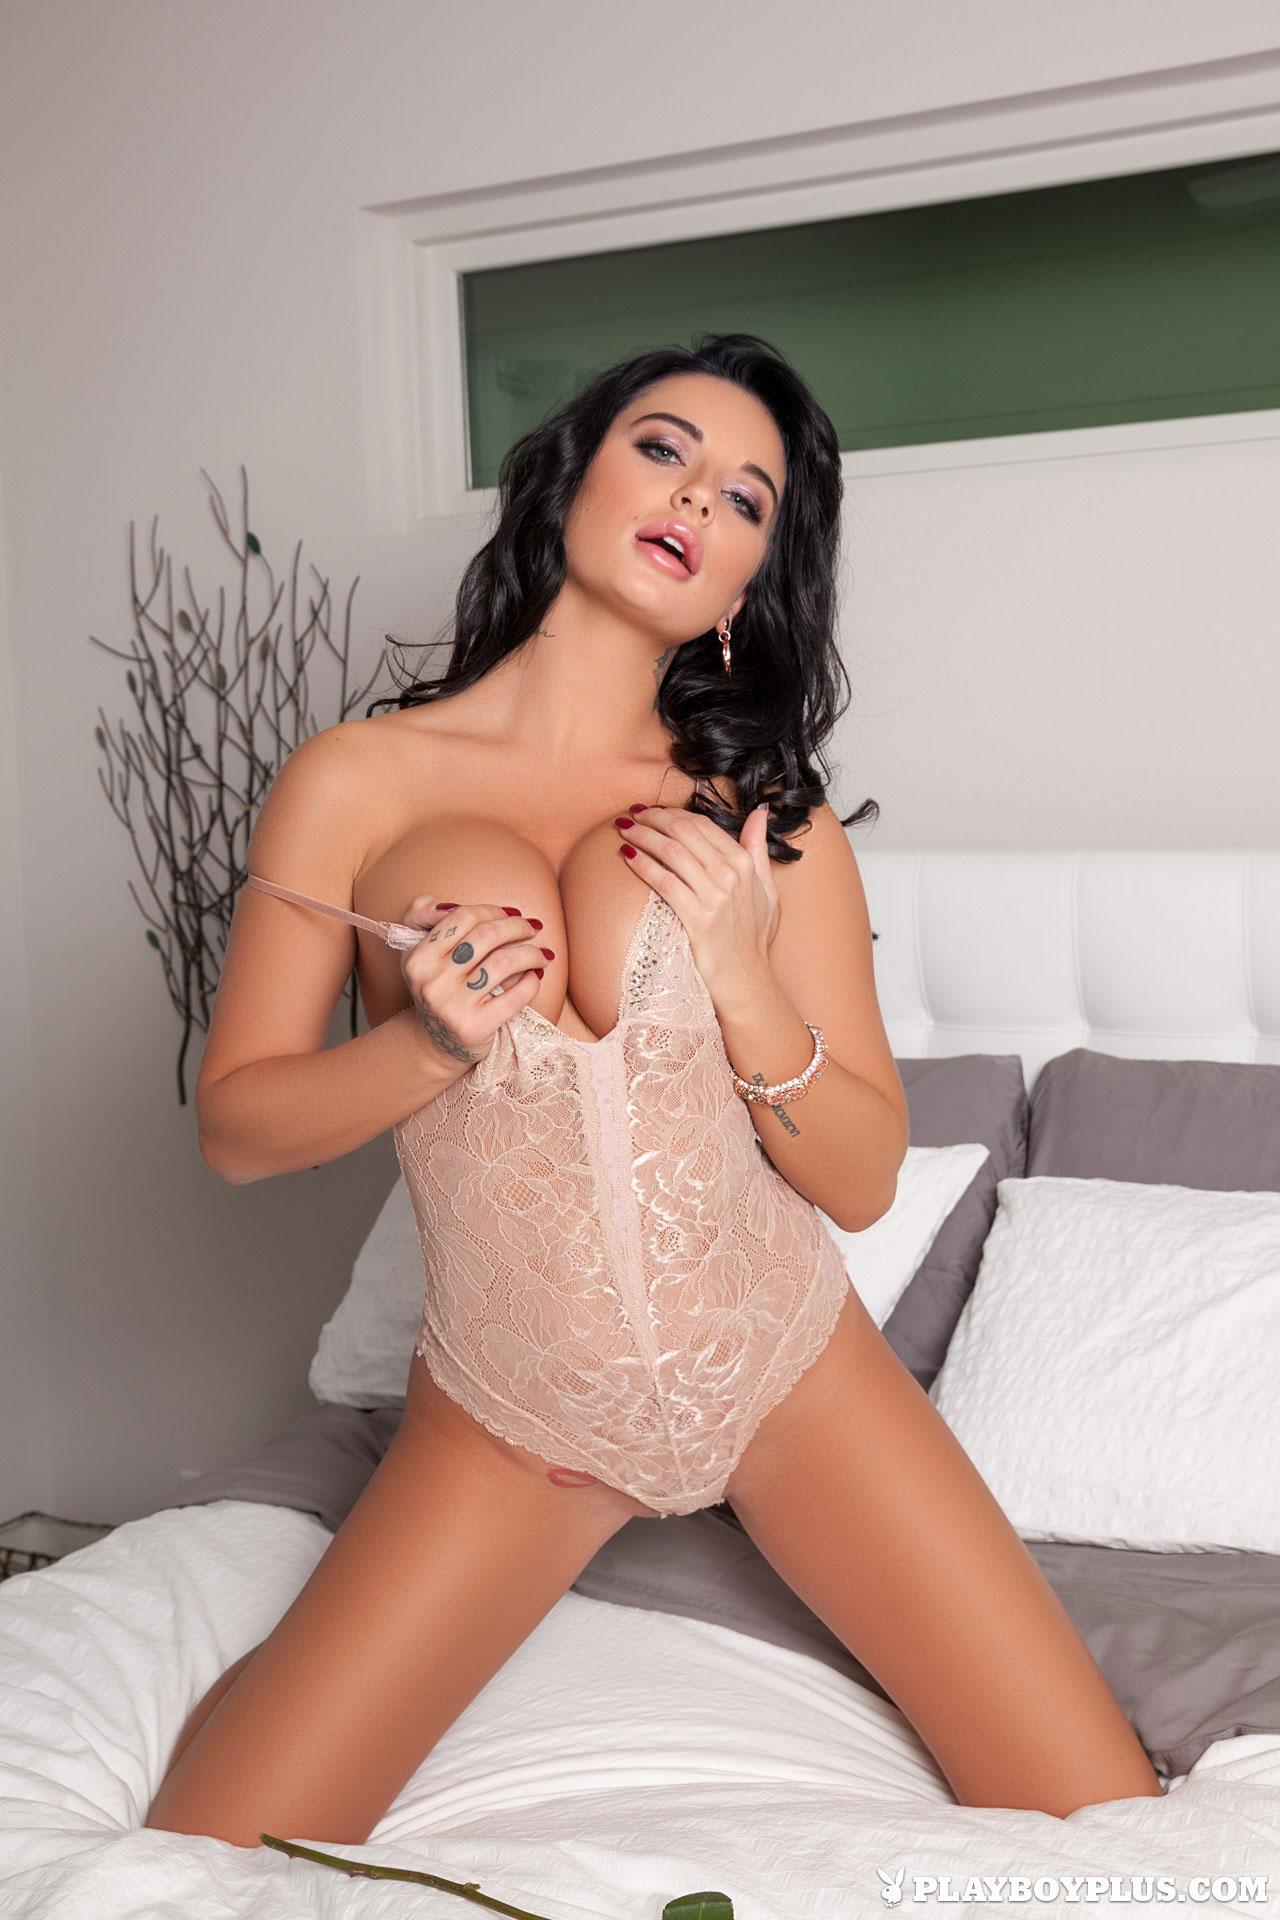 brittney-shumaker-roses-naked-bedroom-playboy-04